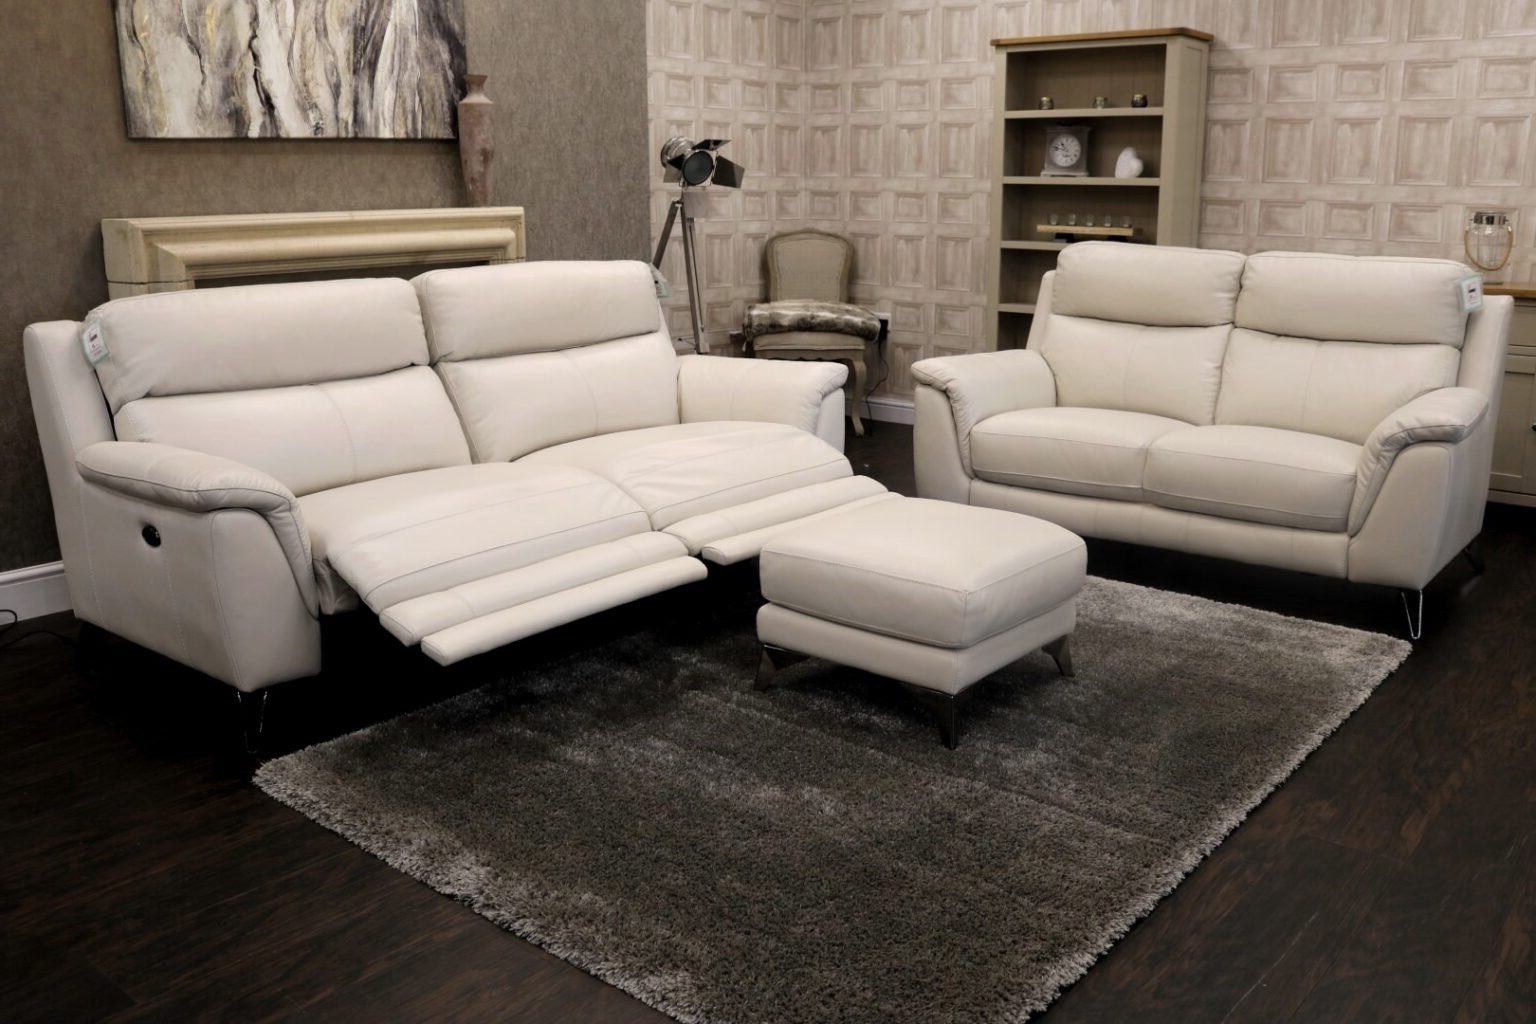 Favorite New Incanto Contempo (famous Designer Brand) Premium Soft Regarding Contempo Power Reclining Sofas (View 9 of 20)